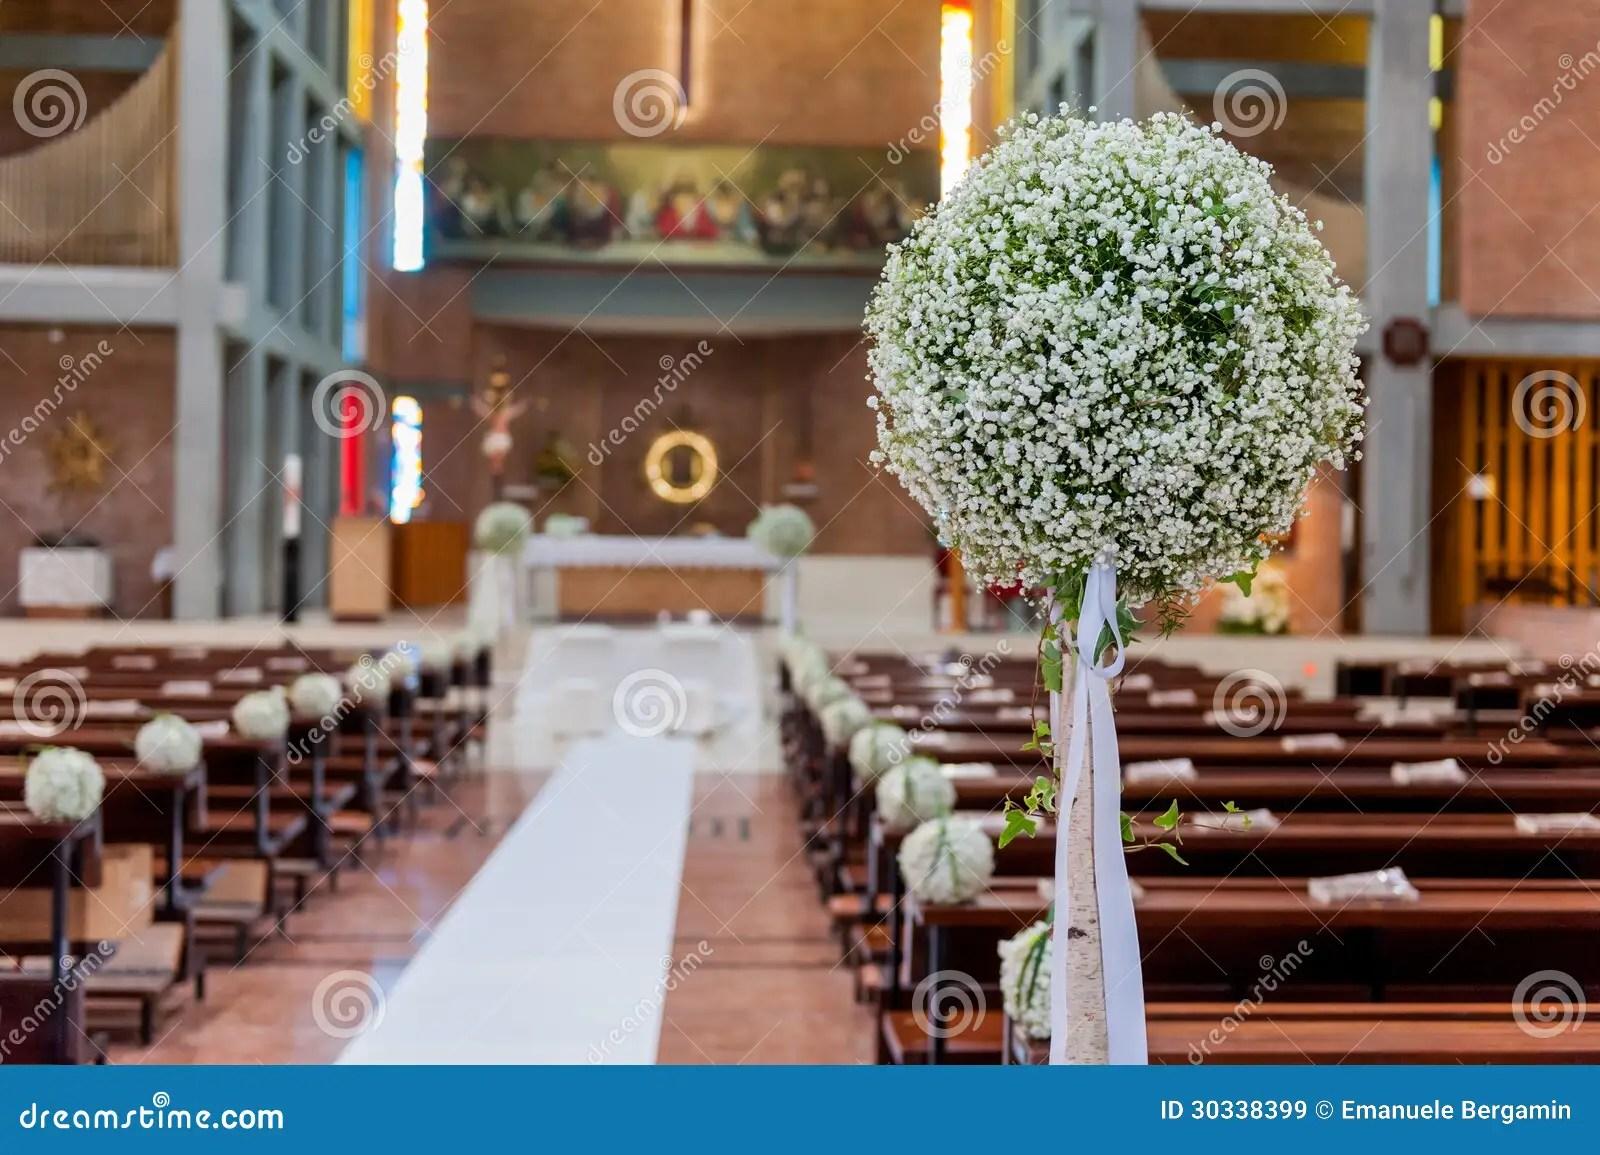 White flowers in church stock image Image of bricks  30338399